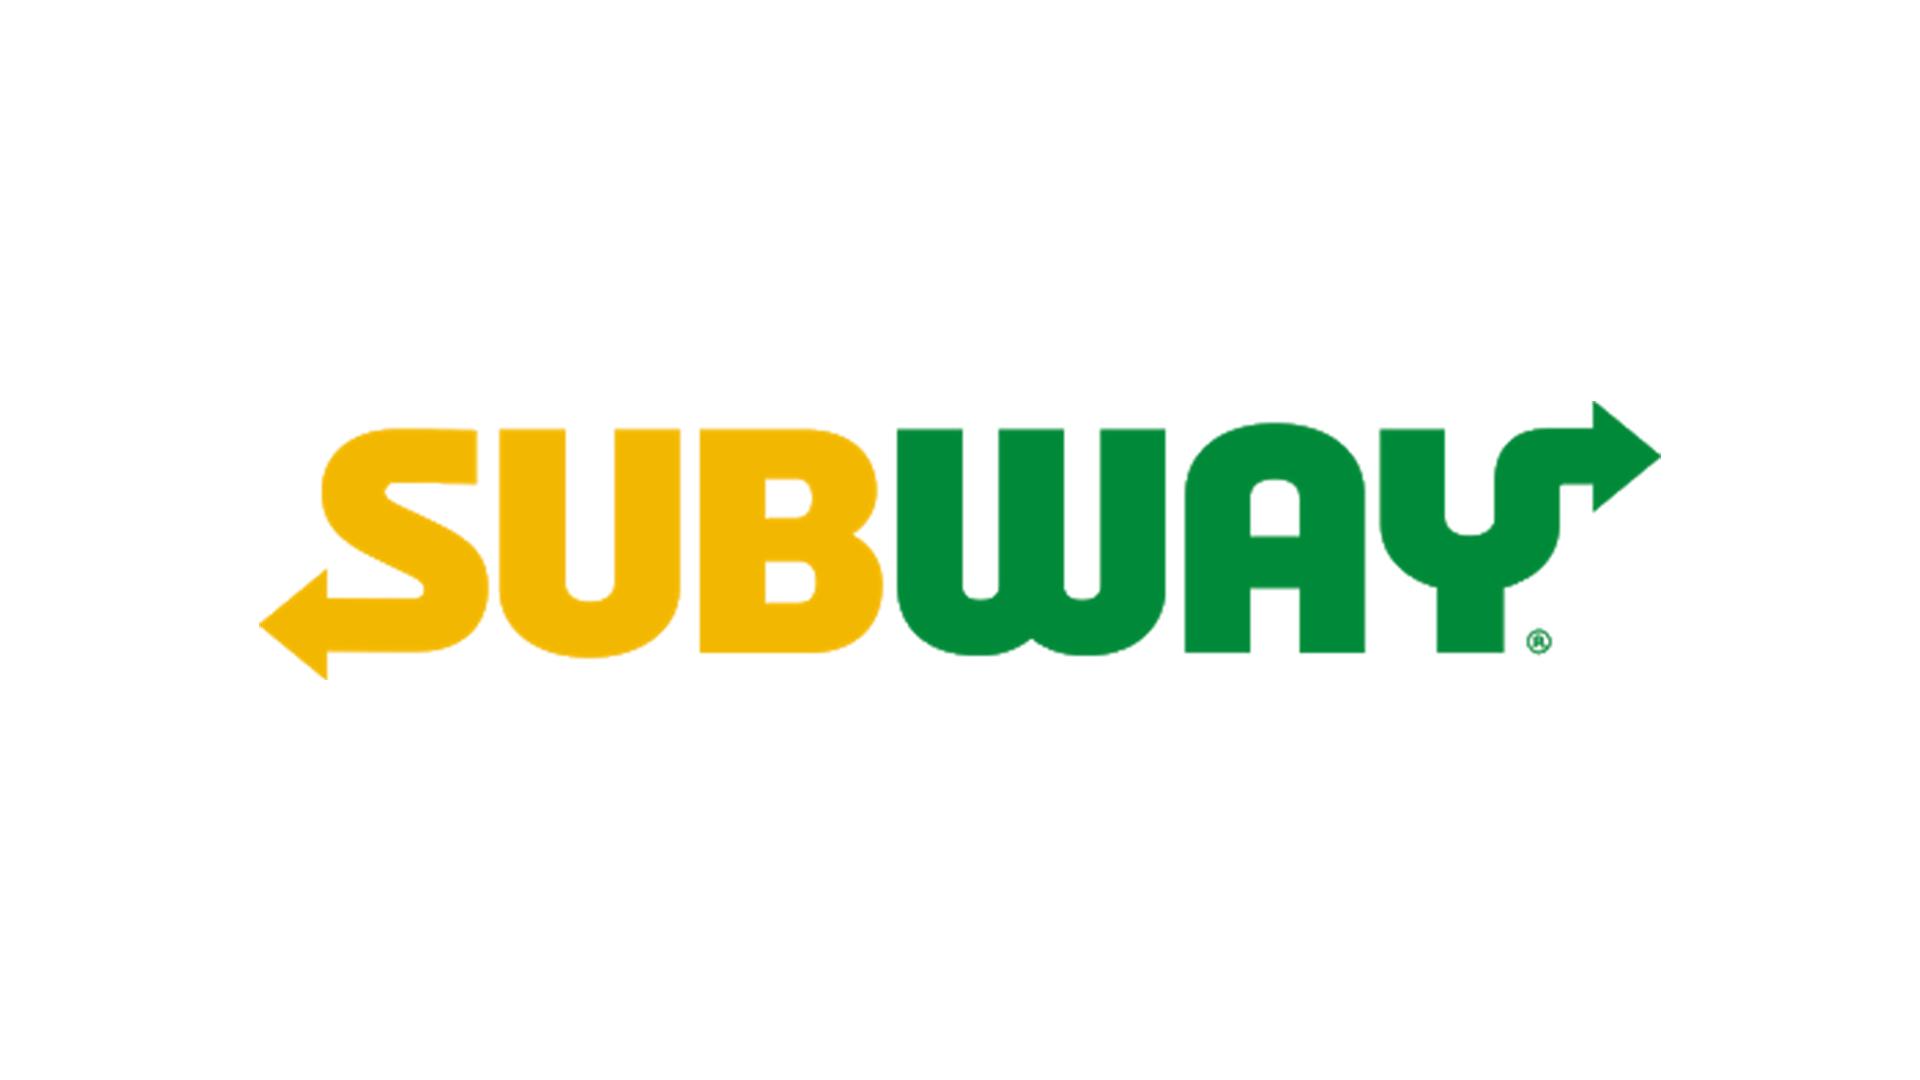 Subway_02